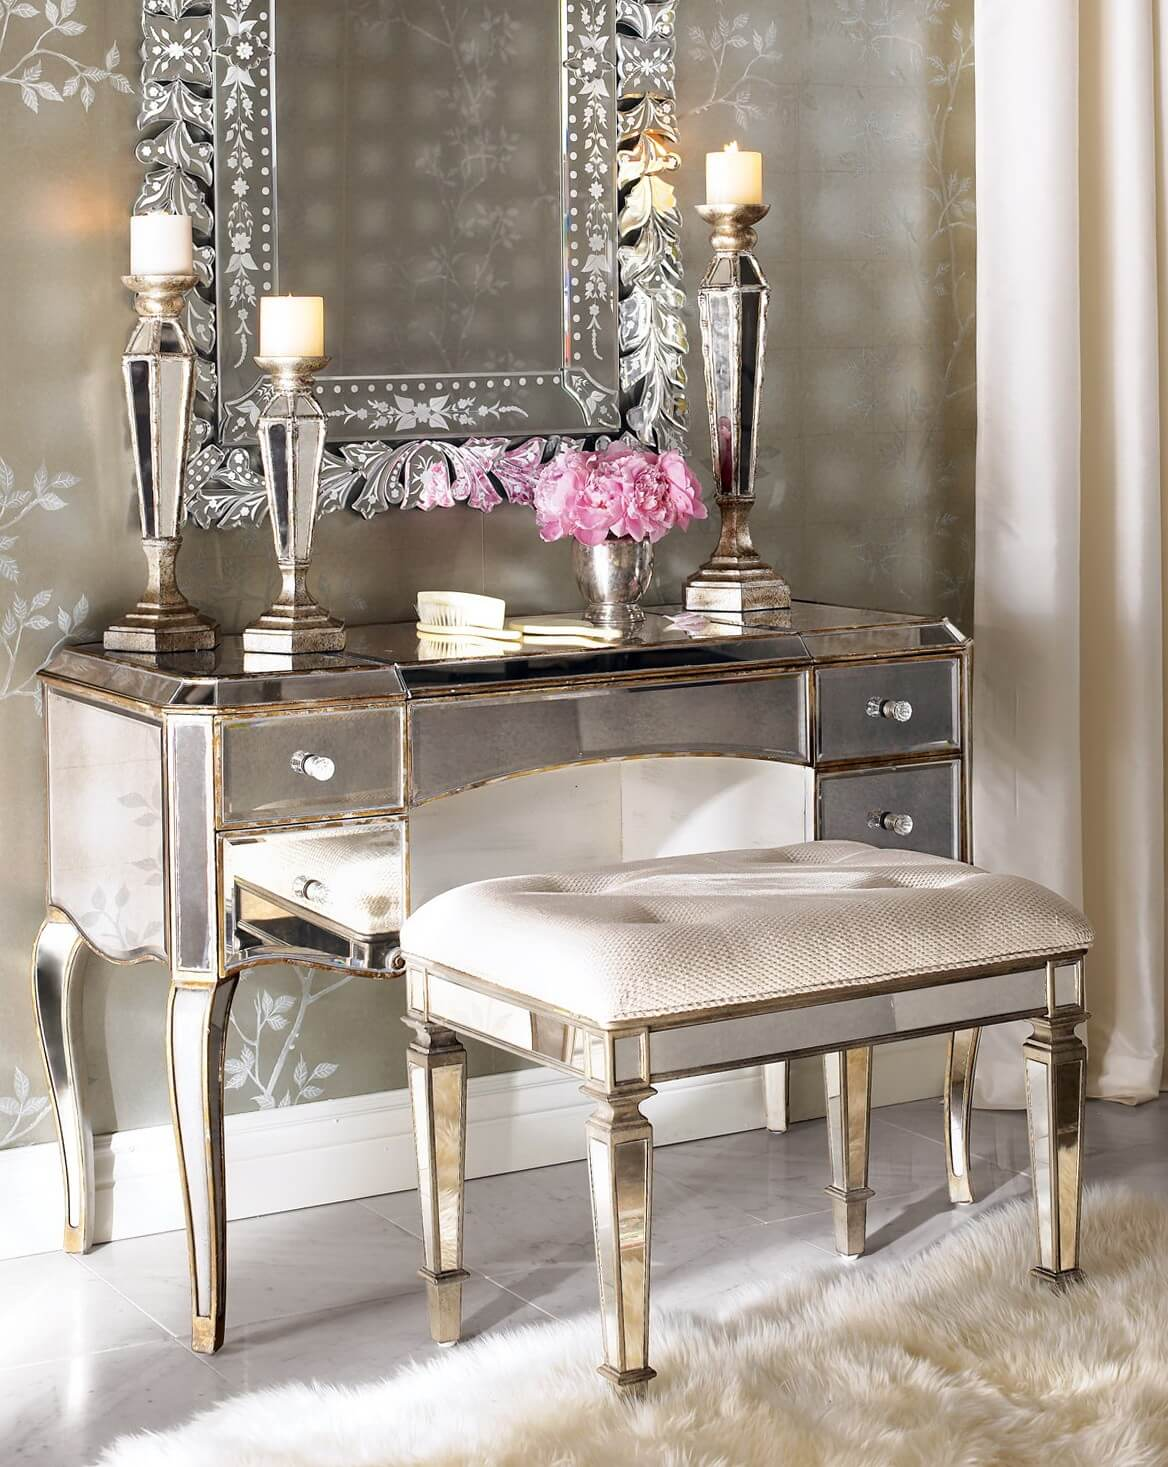 Bedroom Vanity Set with Lights Ideas